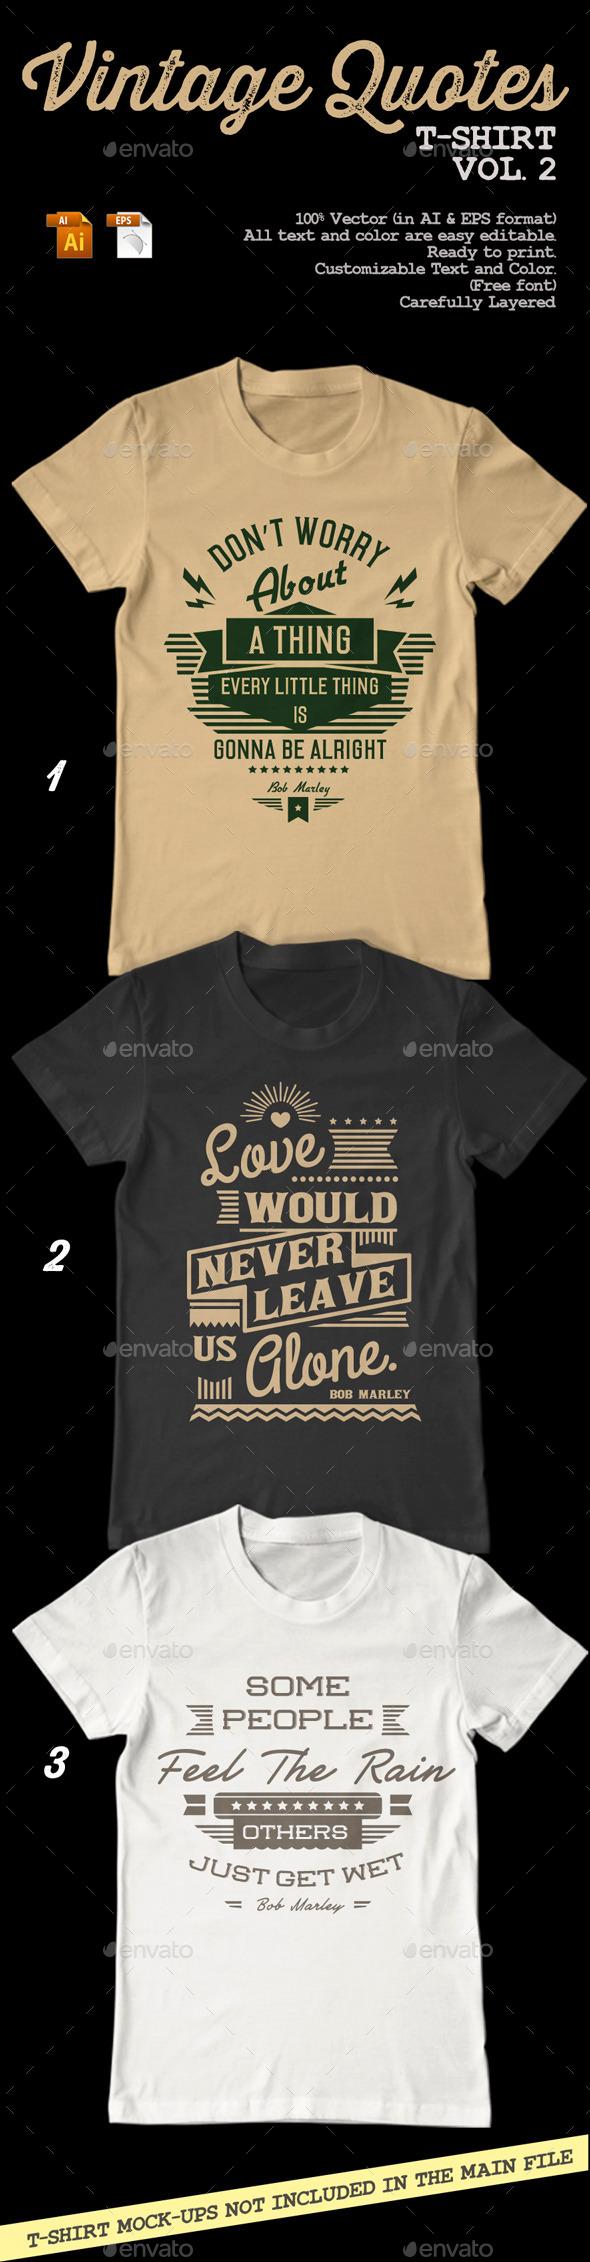 free download t shirt design ai file